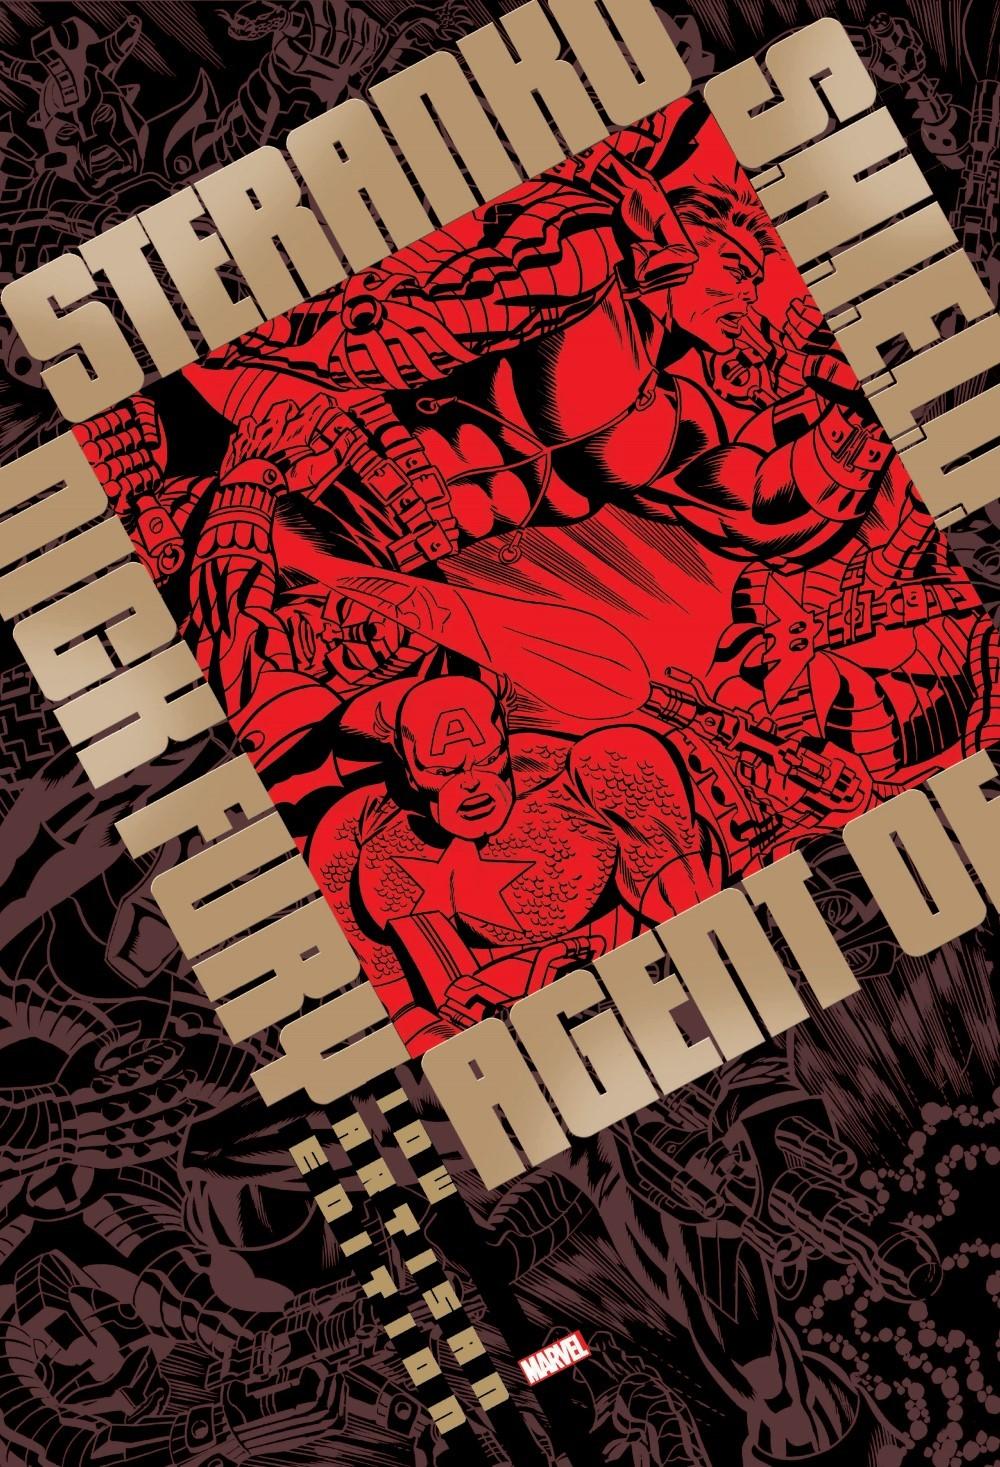 STERANKO_artisan_edition_pr-1 ComicList Previews: JIM STERANKO'S NICK FURY AGENT OF S.H.I.E.L.D. ARTISAN EDITION TP